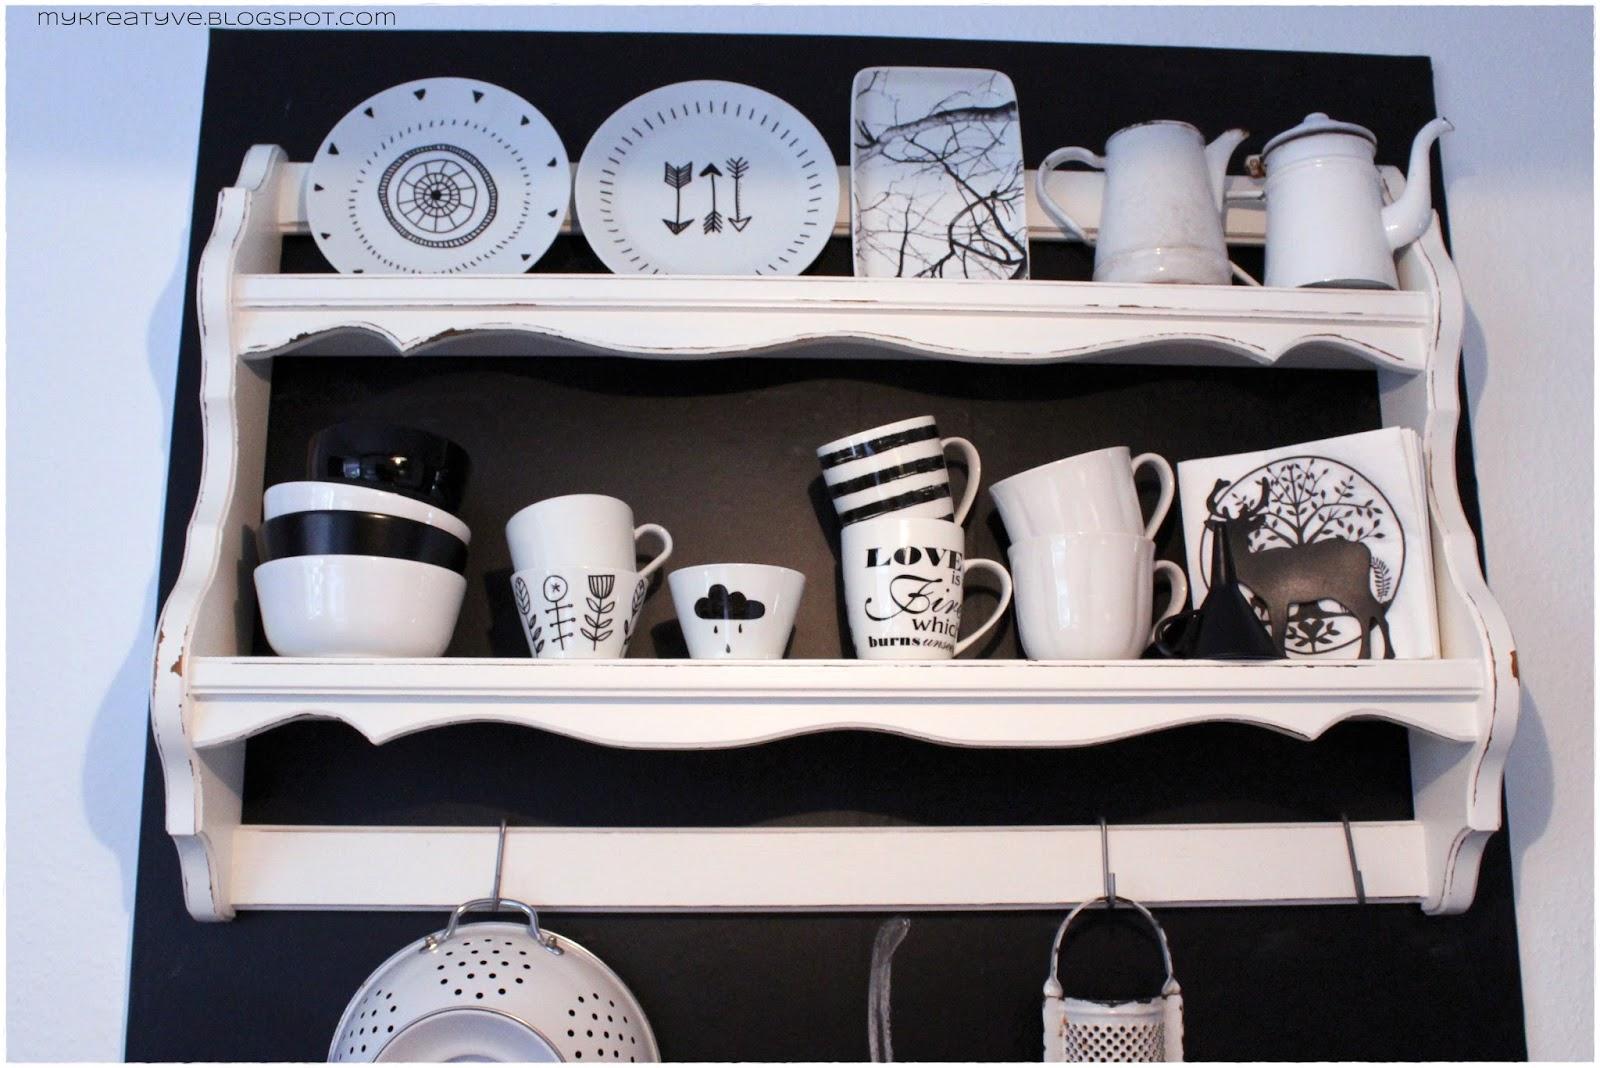 Kreatyve: DIY Porzellan bemalen & neues Design